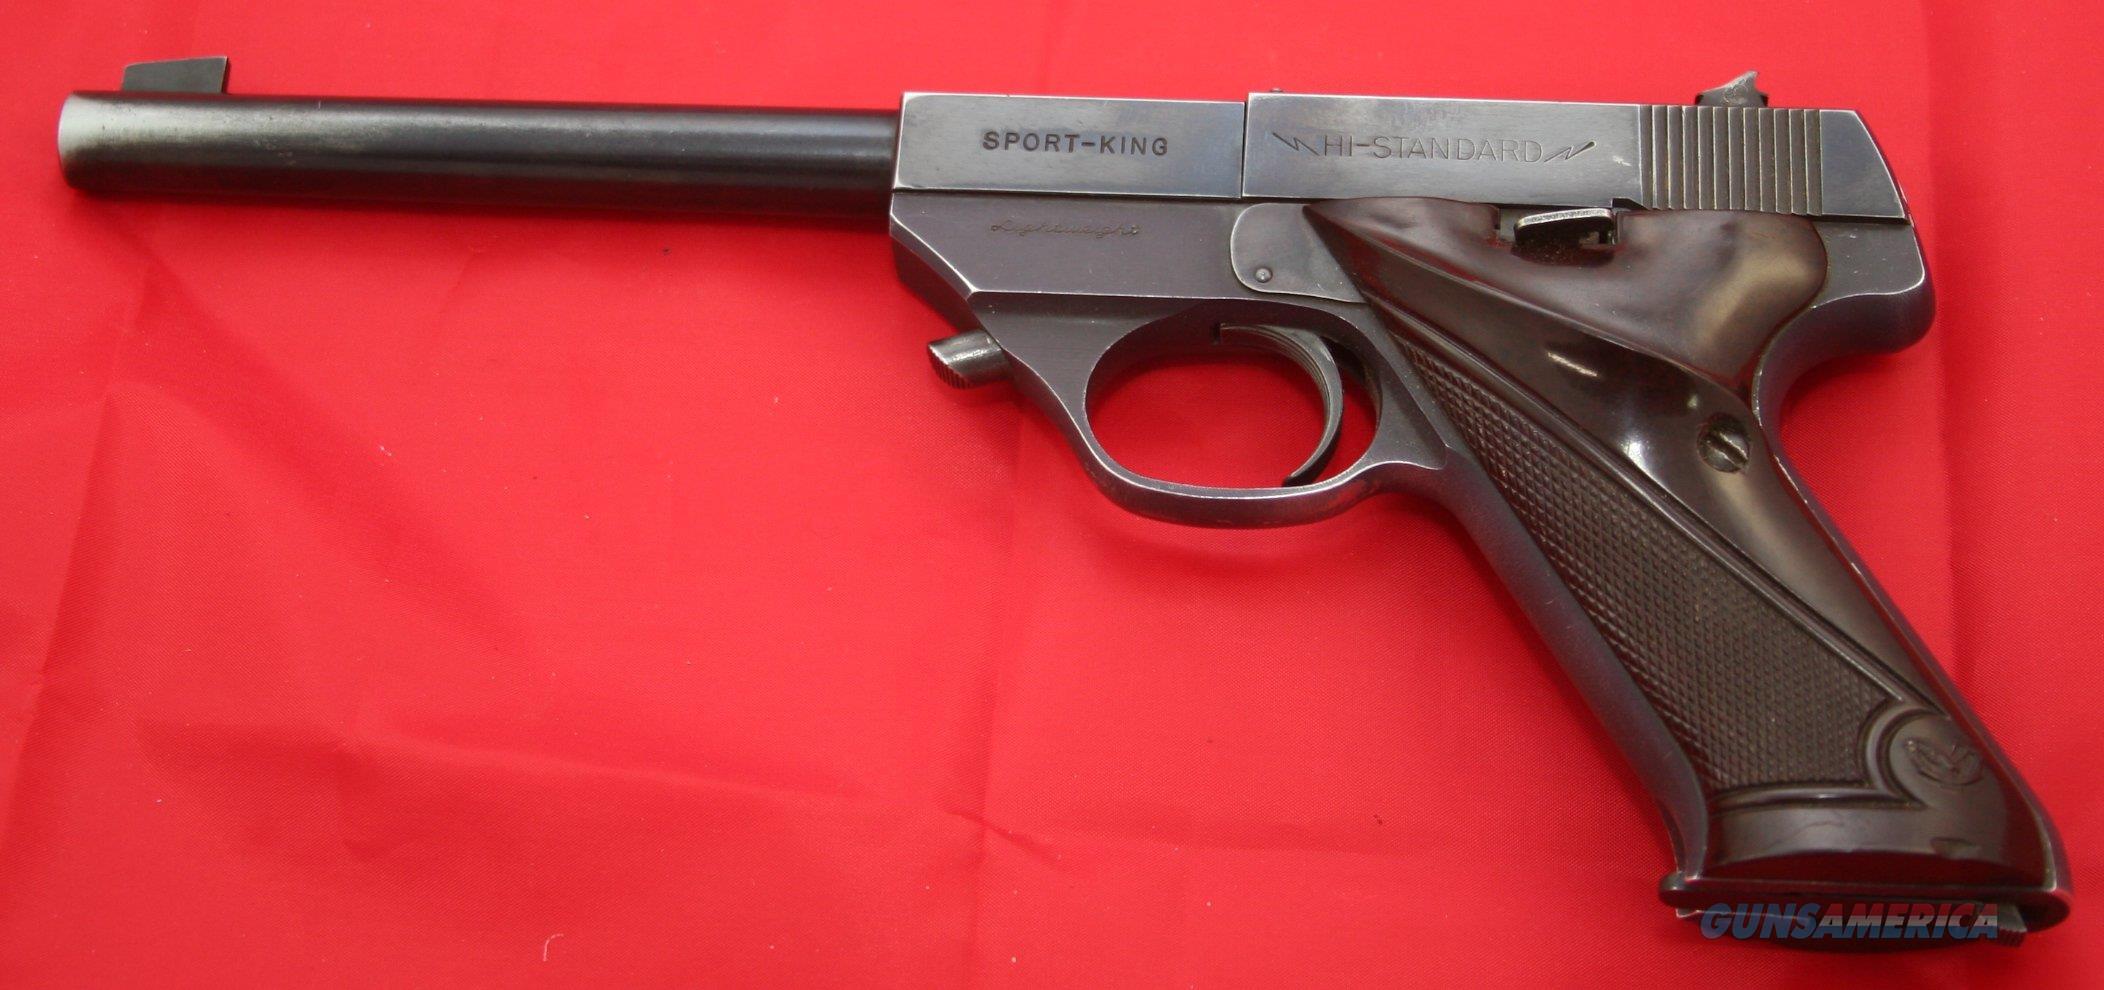 High Standard Sport King Lightweight Model SK-100 Semi-Auto Pistol C&R .22 LR  Guns > Pistols > High Standard Pistols